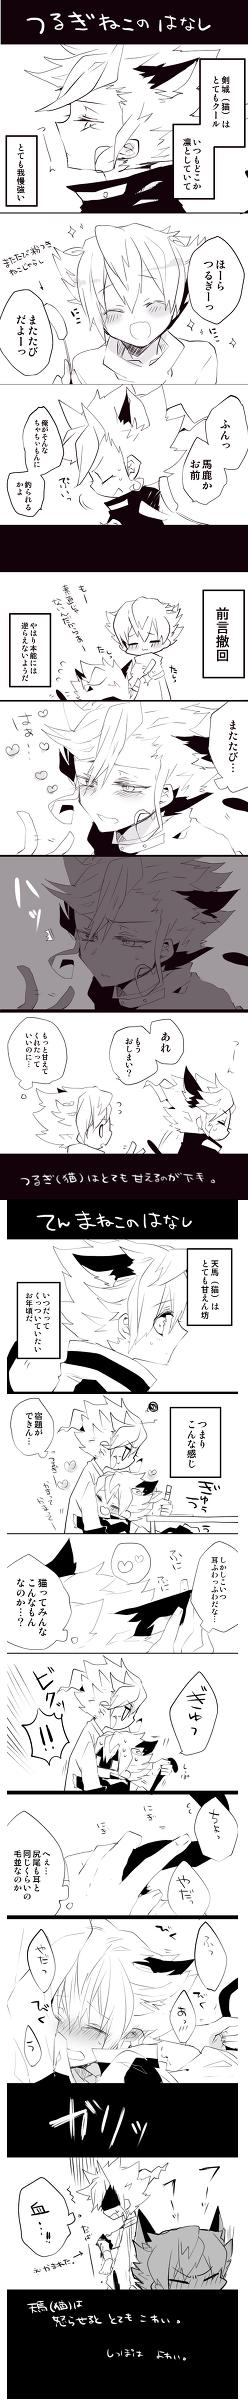 Tags: Anime, Level-5, Inazuma Eleven GO, Matsukaze Tenma, Tsurugi Kyousuke